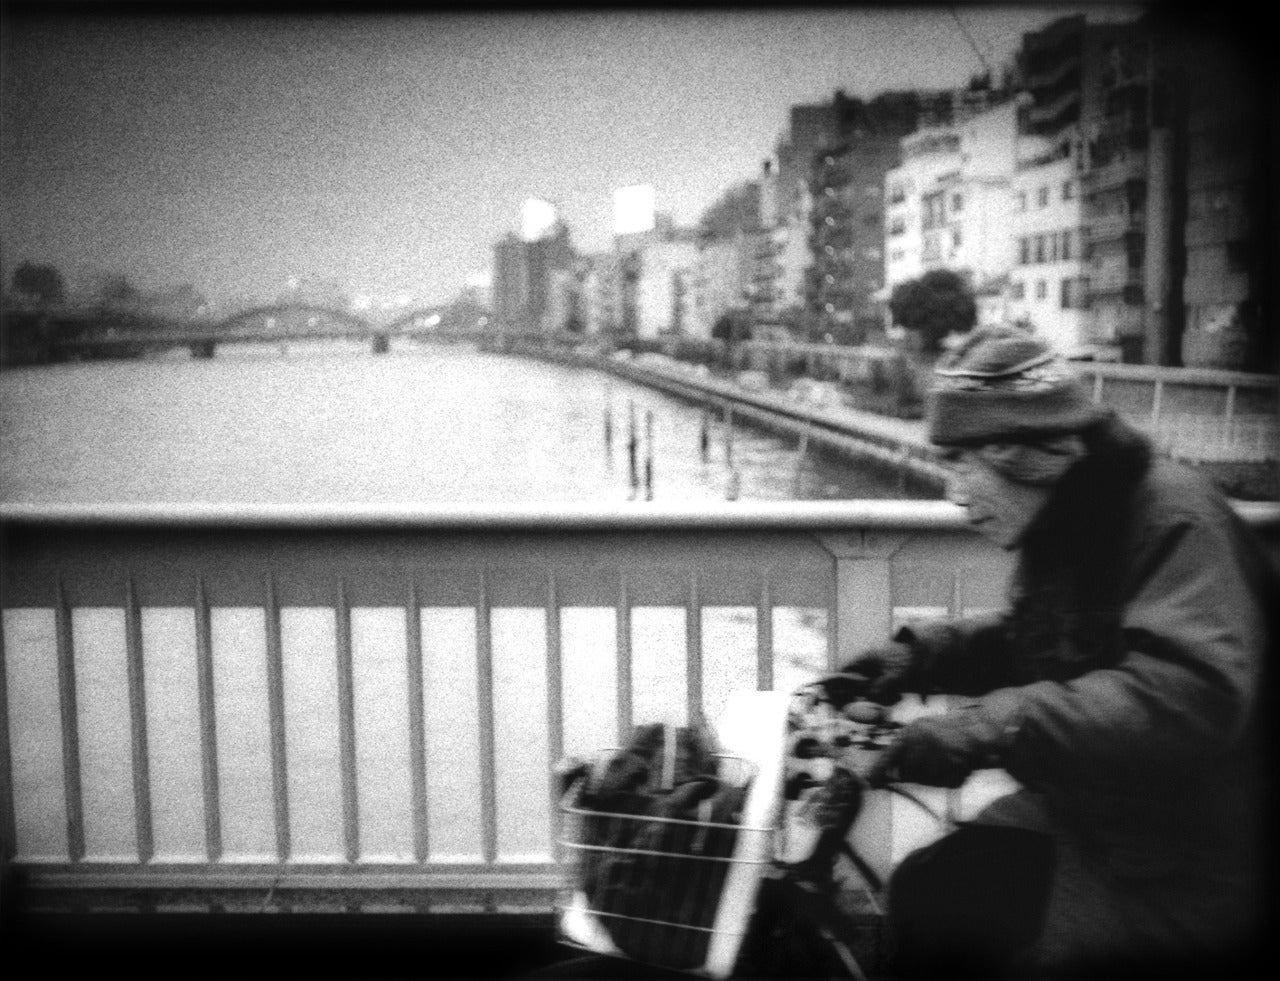 Cycling across Sumida River Bridge in Ueno, Tokyo